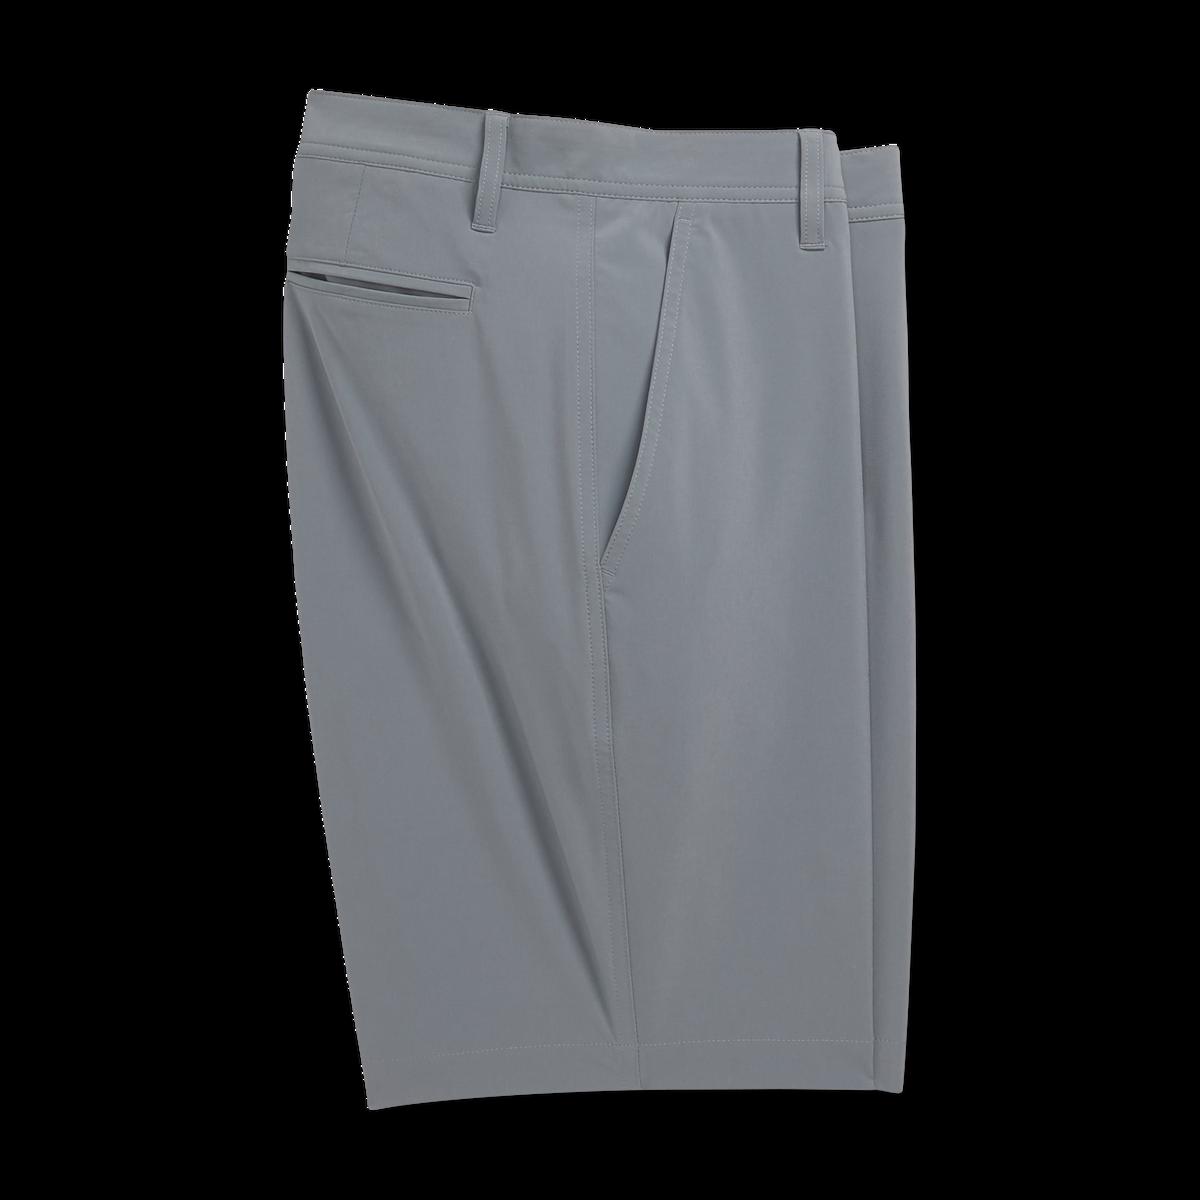 FootJoy Shorts (Grey): $78